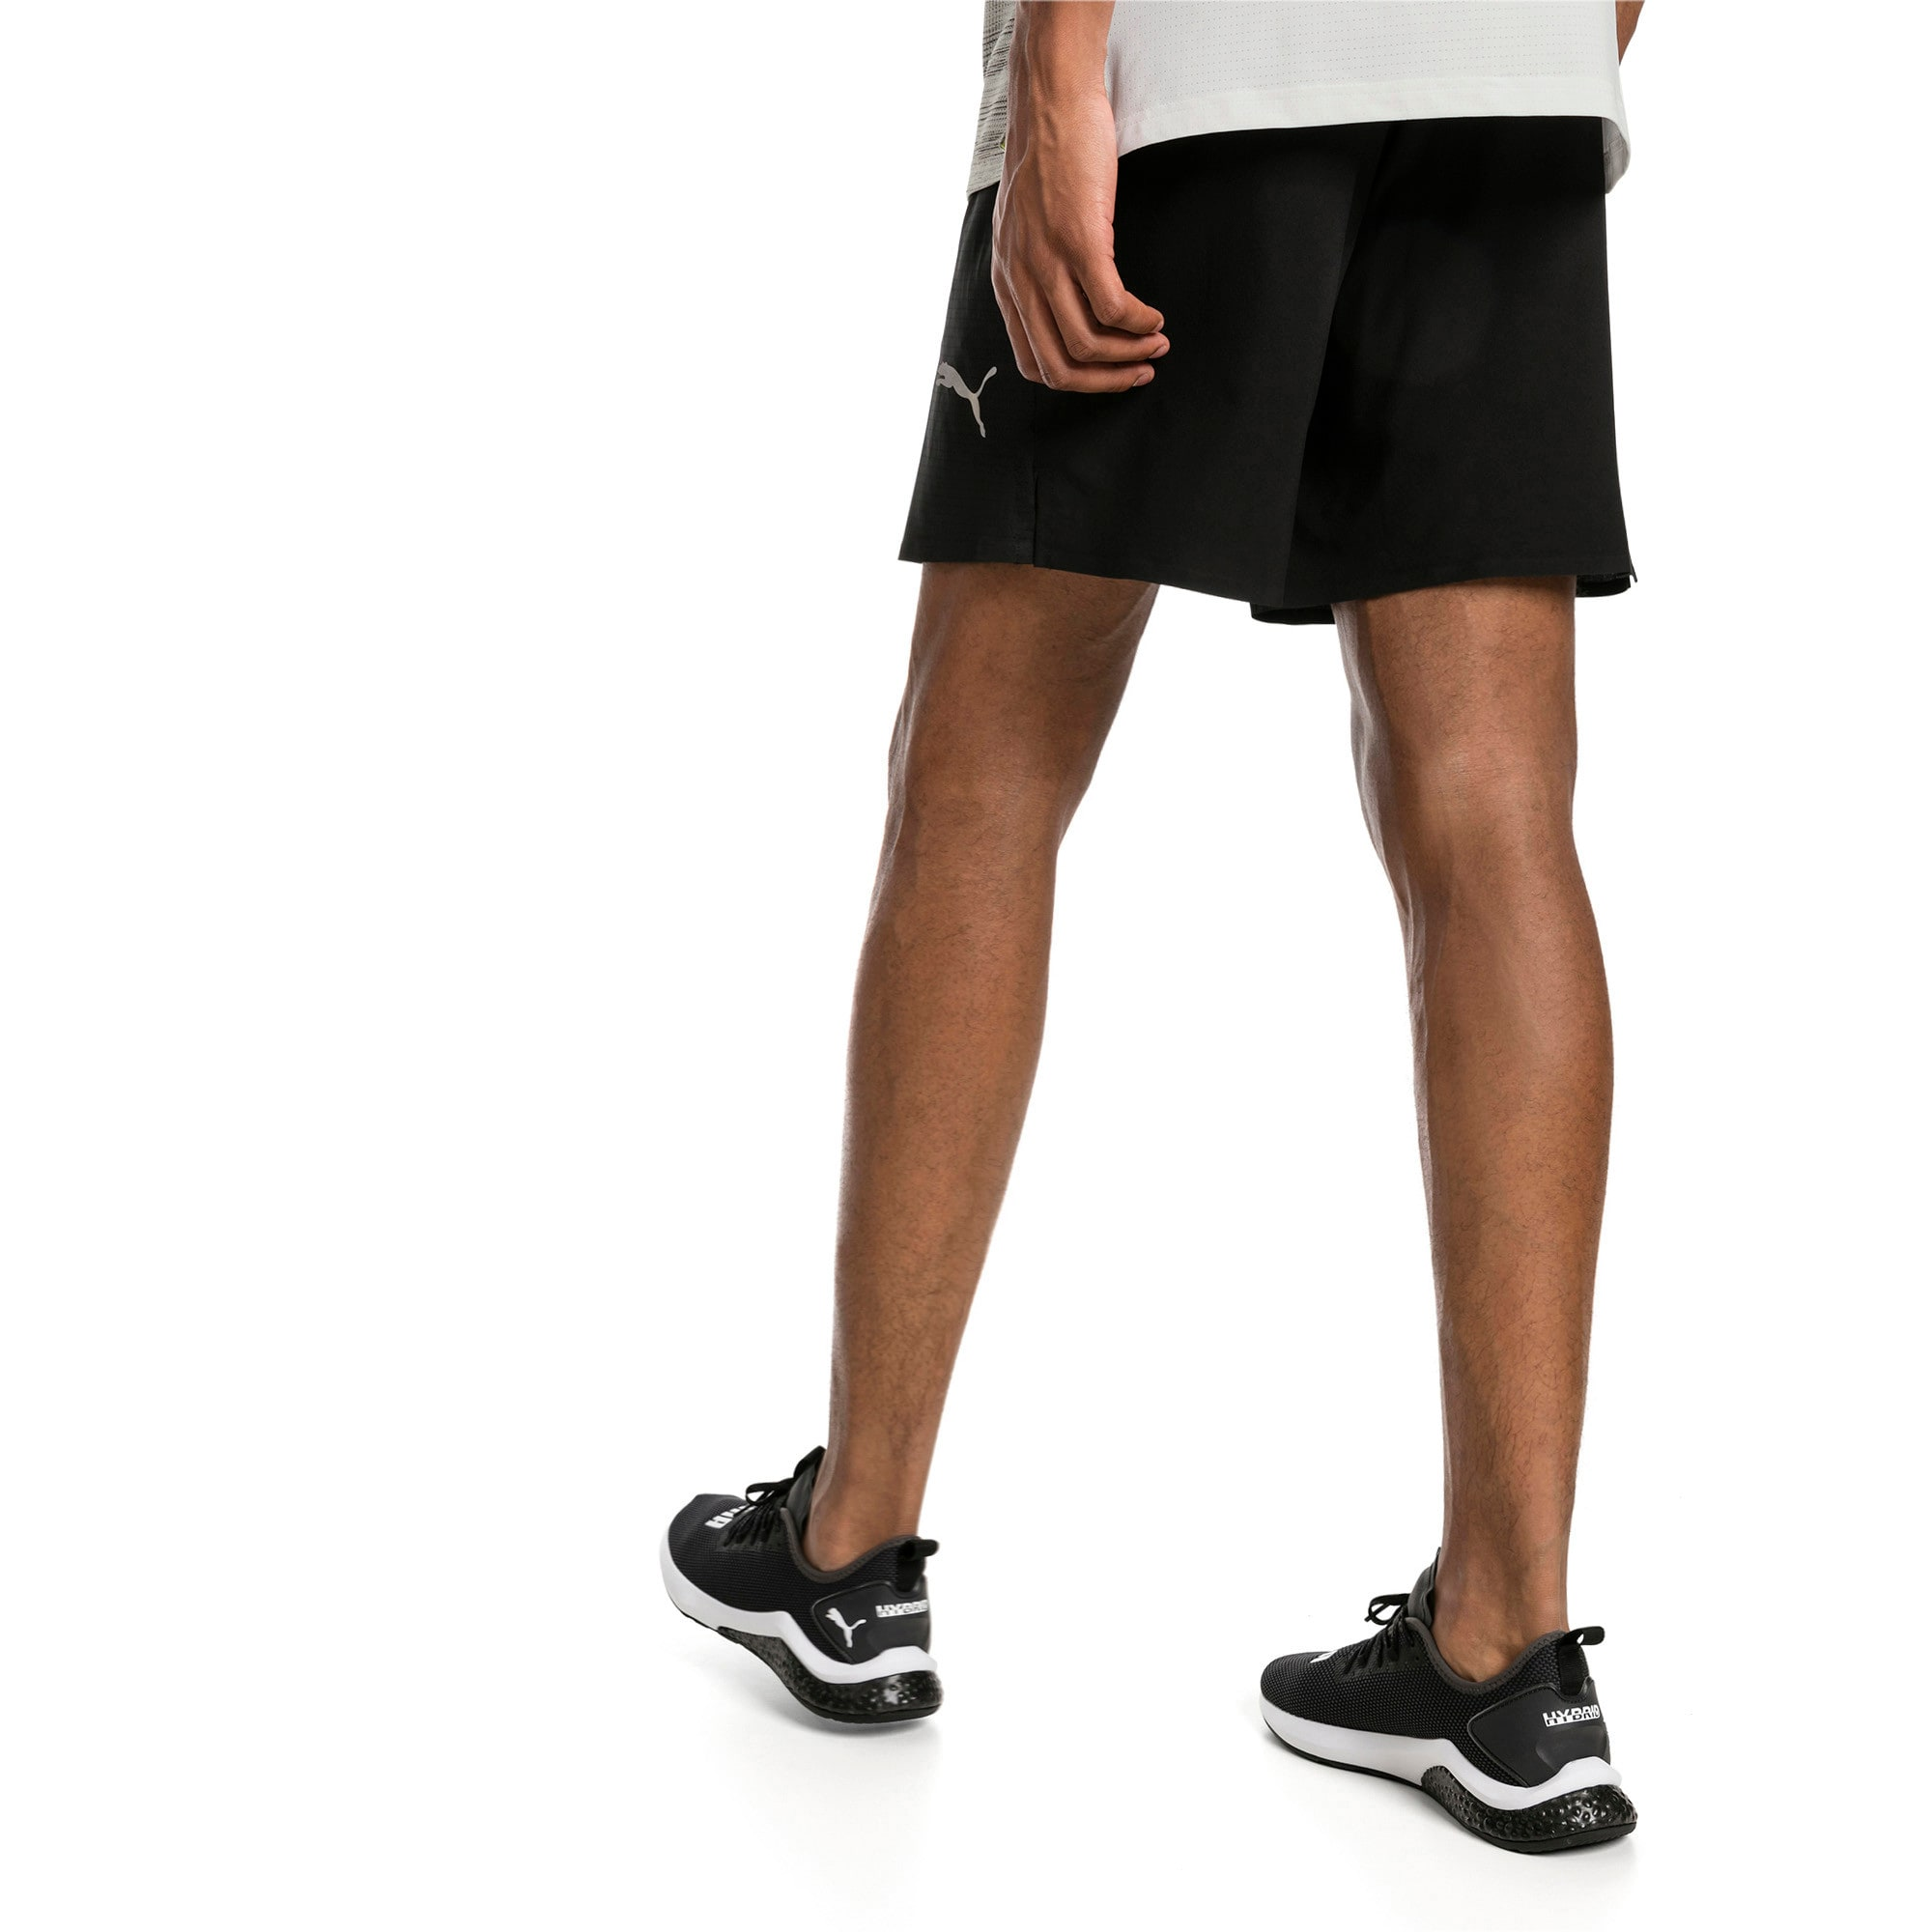 Thumbnail 2 of PACE Breeze Men's Shorts, Puma Black, medium